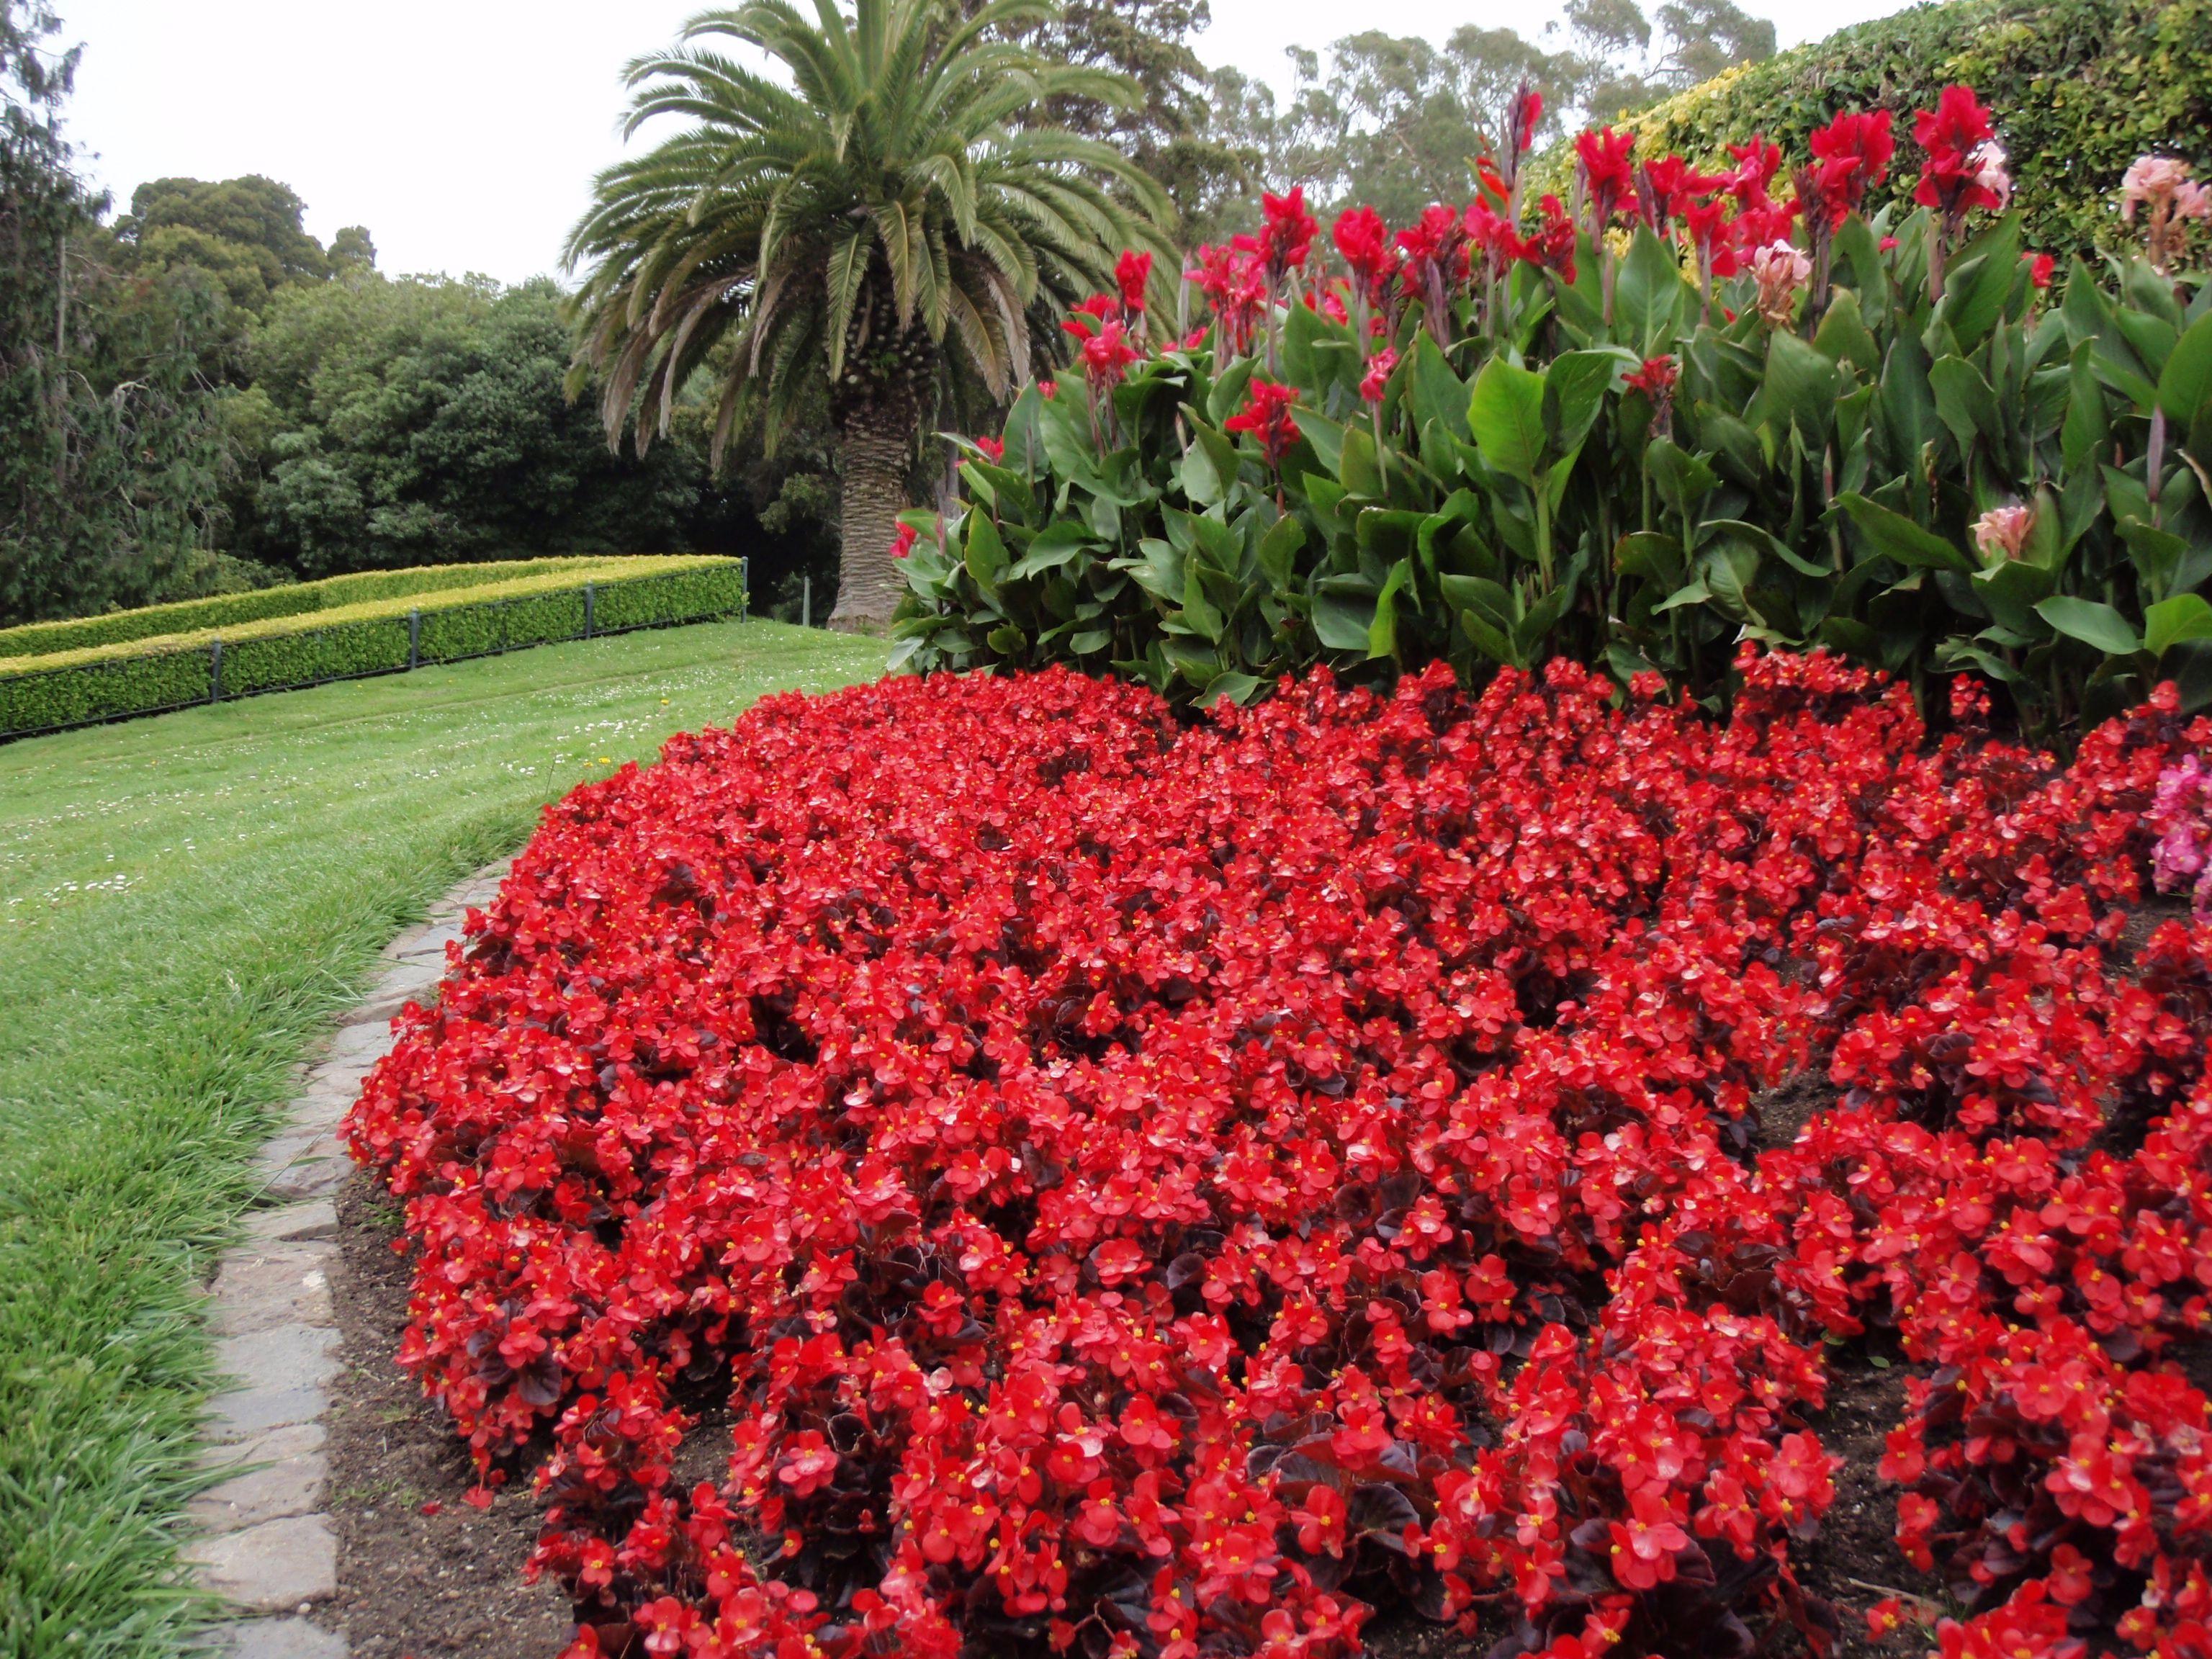 Begonia Semperflorens Wax Begonia Begonia Begonia Annual Bedding Plants Annual Garden